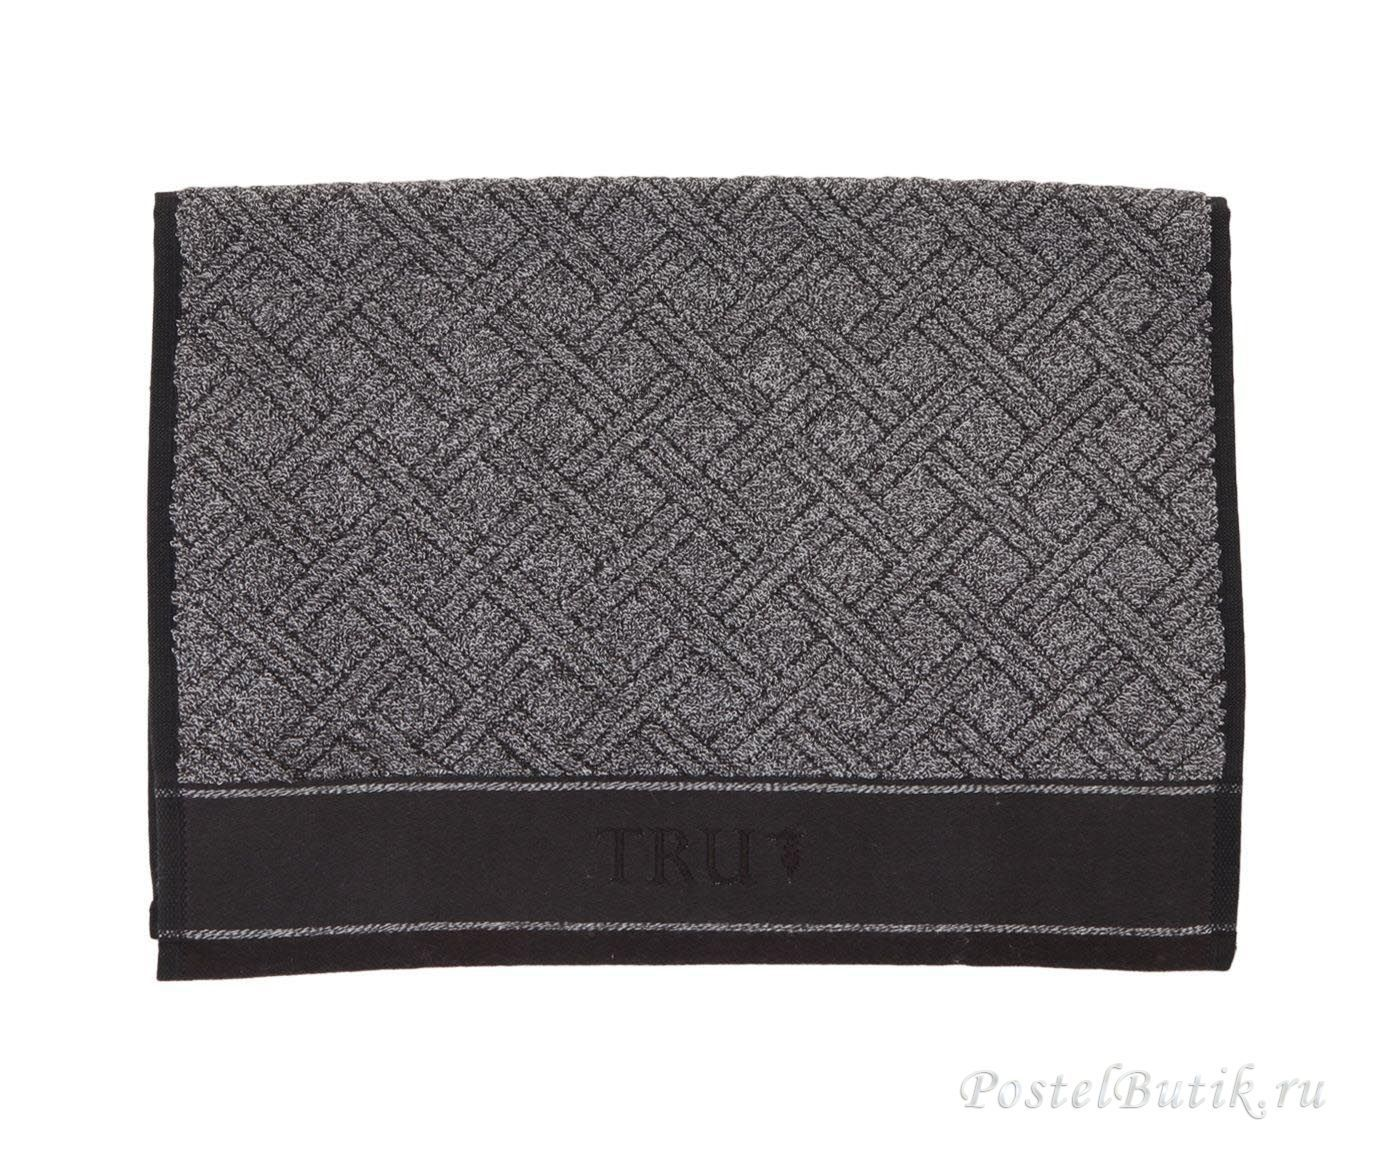 Наборы полотенец Набор полотенец 2 шт Trussardi Stir серый komplekt-mahrovih-polotenets-stir-ot-trussardi-uzor.jpg